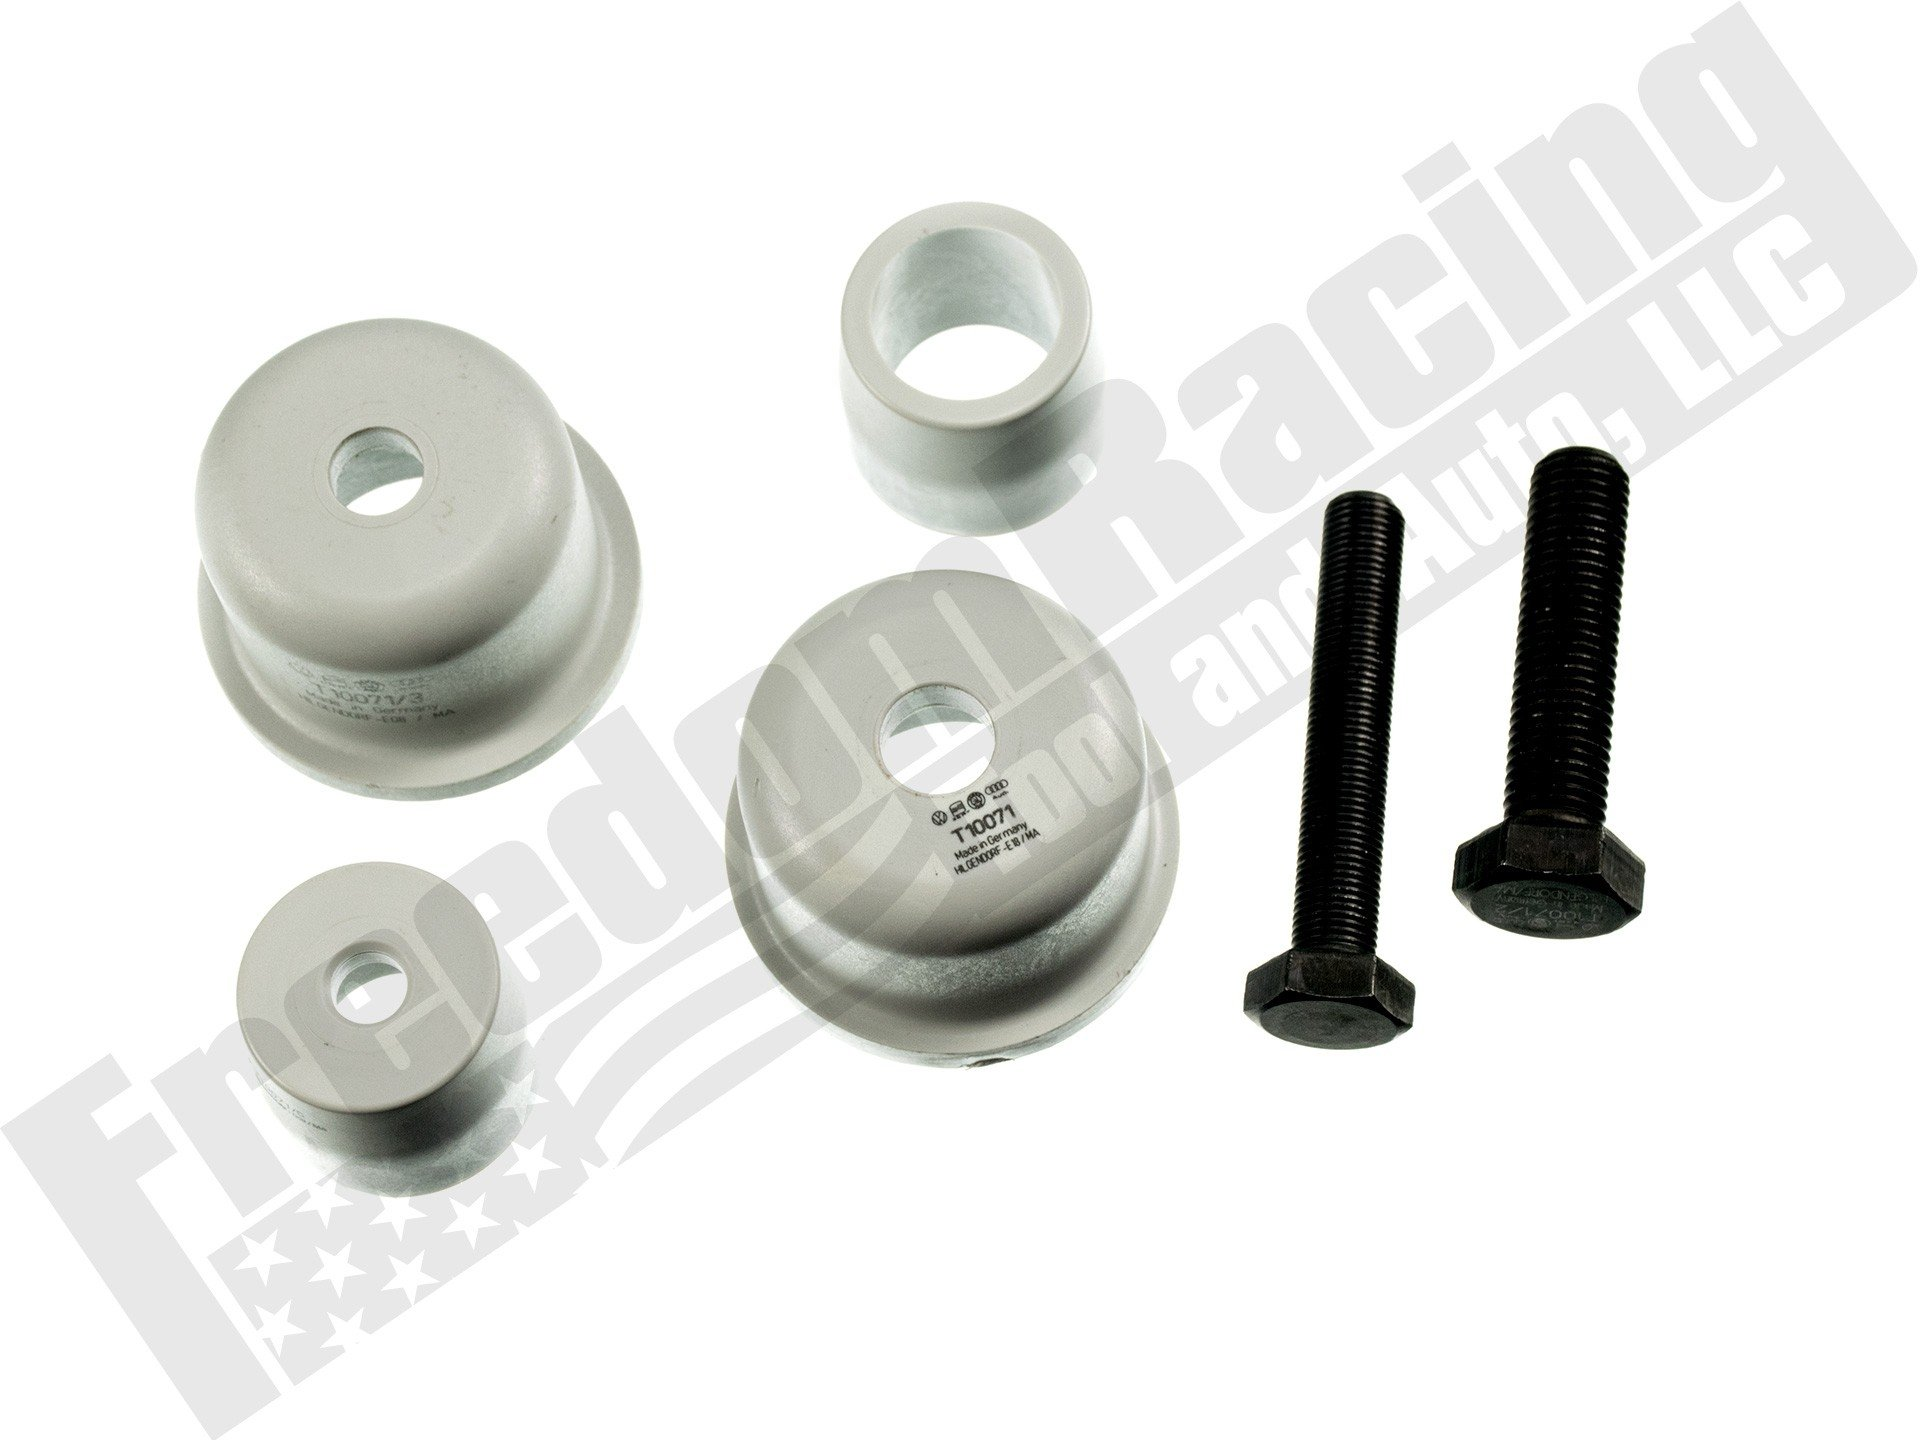 T10071 PTFE Camshaft Oil Seal Installer Tool